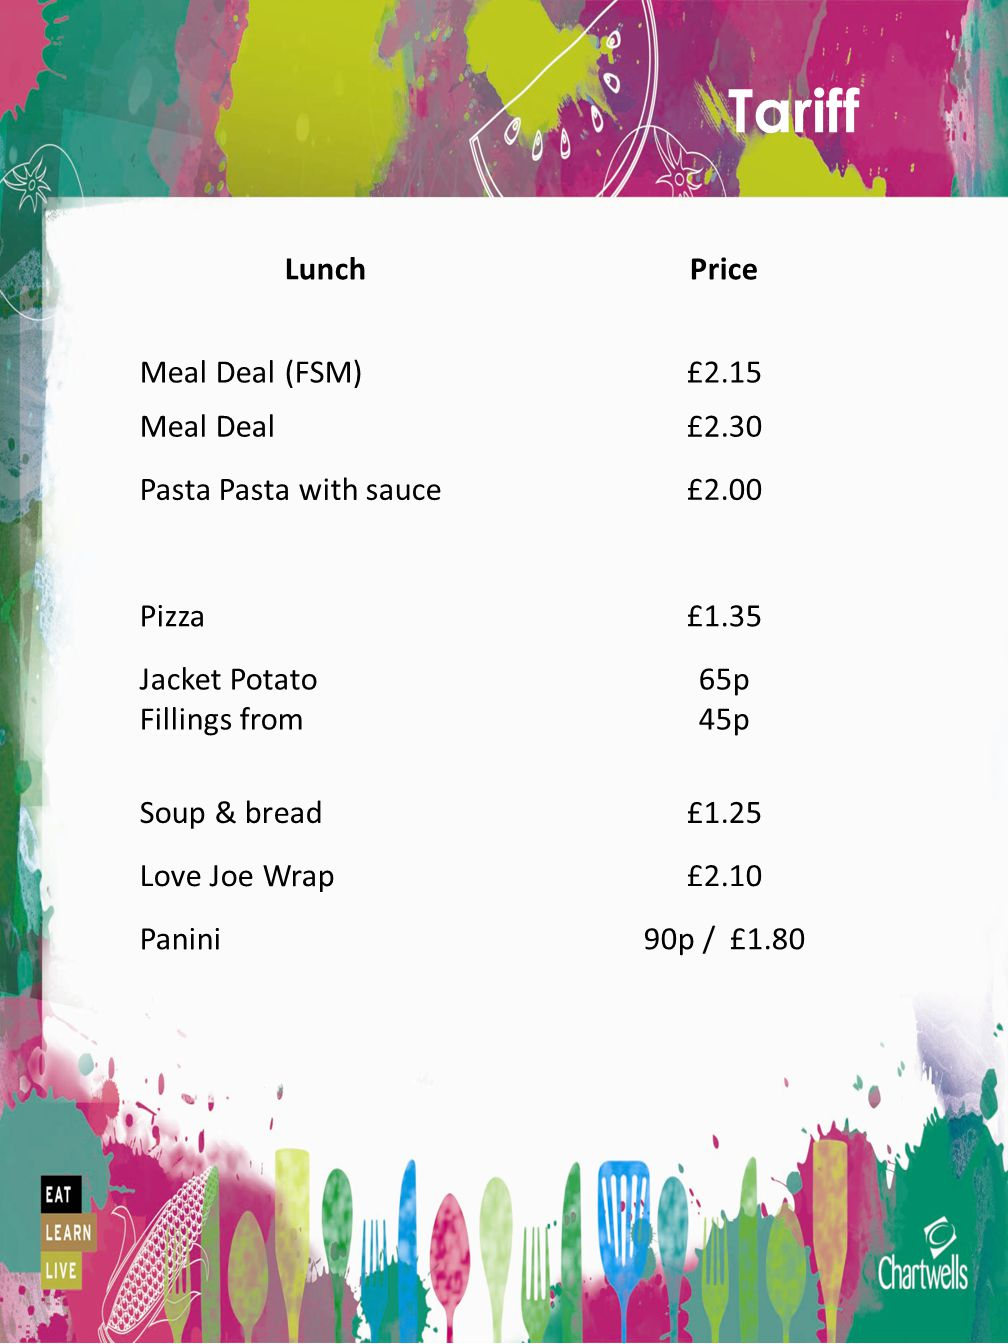 Tariff Grab & GoPrice Value Sandwich£1.40 Classic Sandwich£1.70 Crusty Filled Roll£1.40 Plain Roll Mondoes Subs 40p £2.35 Filled Baguette£2.00 Filled Wrap£1.80 Grape Pot Large Fruit Pot 65p £1.00 Pasta Salad£1.05 Mixed salad Pot£1.70 Yoghurts from45p Fresh Fruit30p